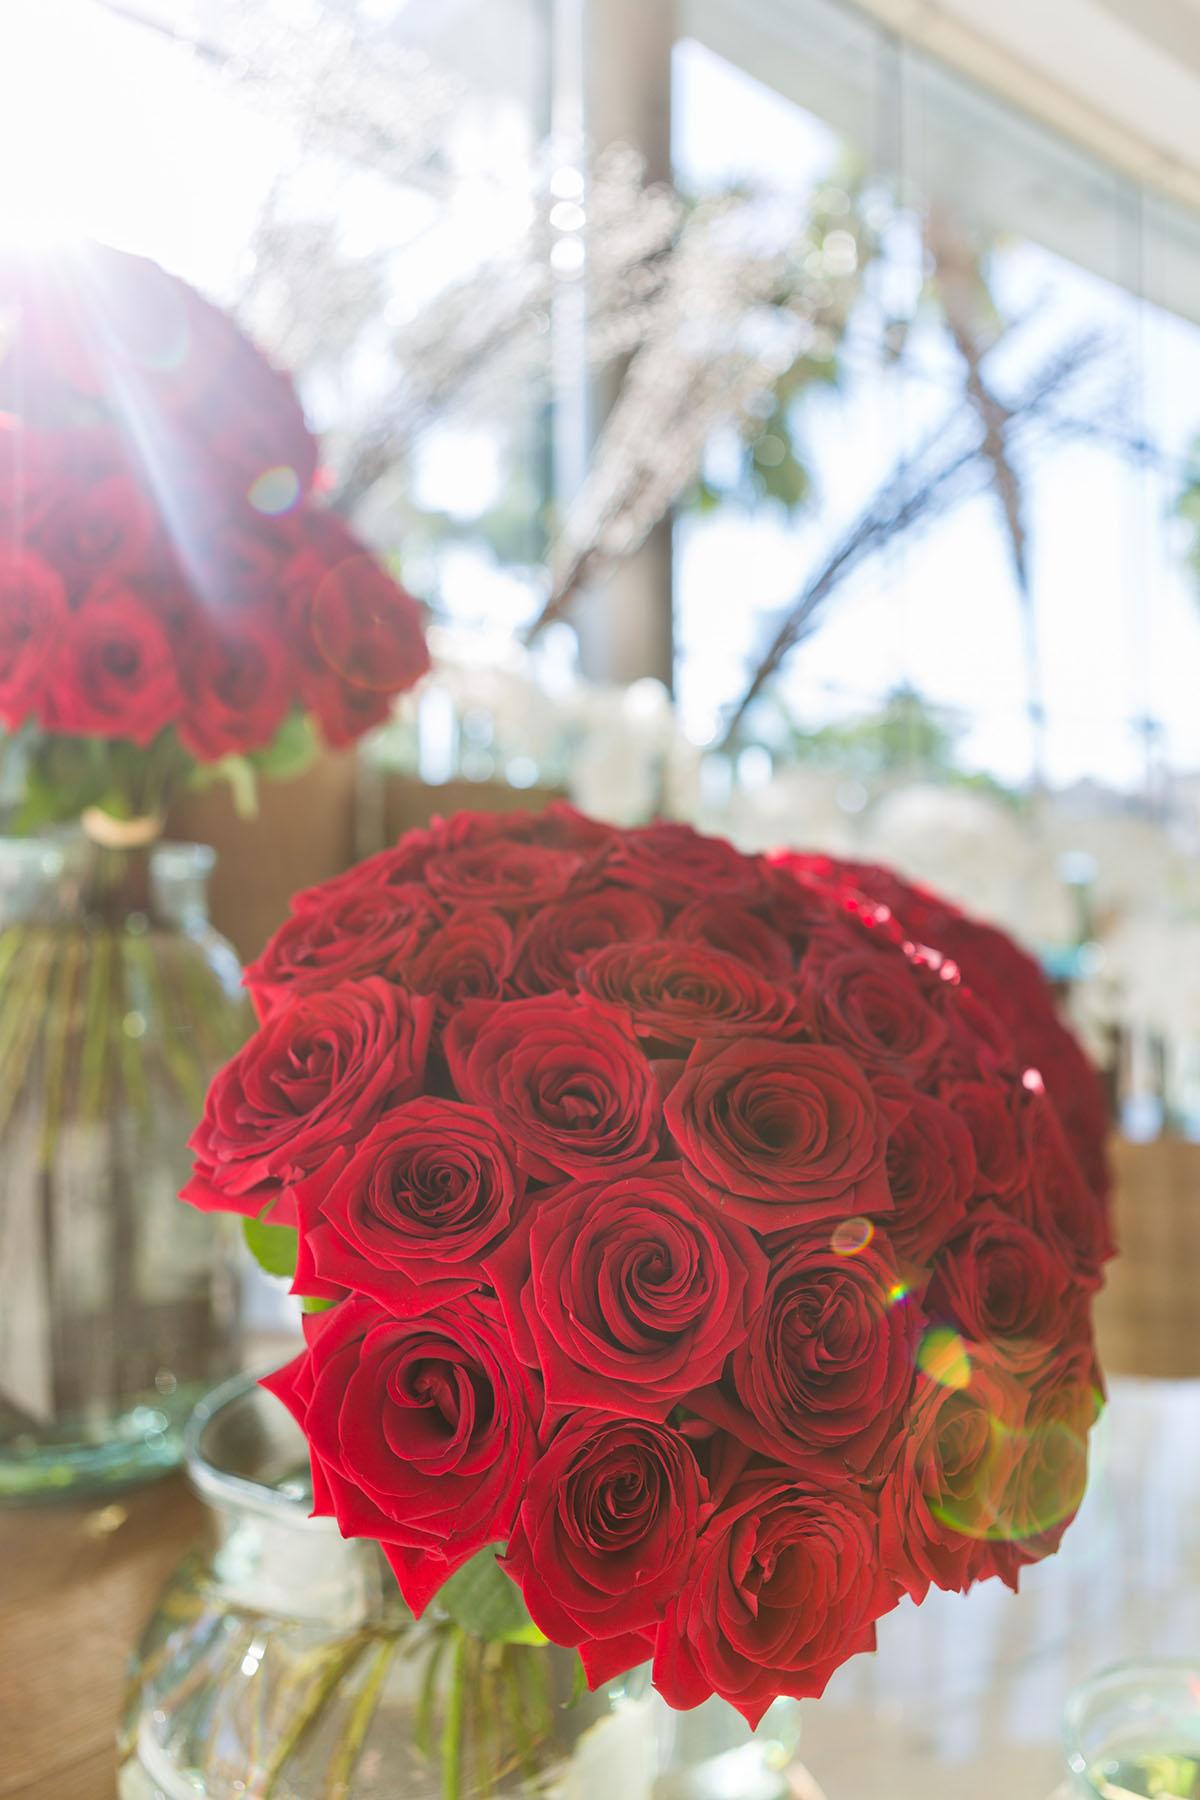 Flowers at Emaar's Address Downtown by Loesje Kessels Fashion Photographer Dubai